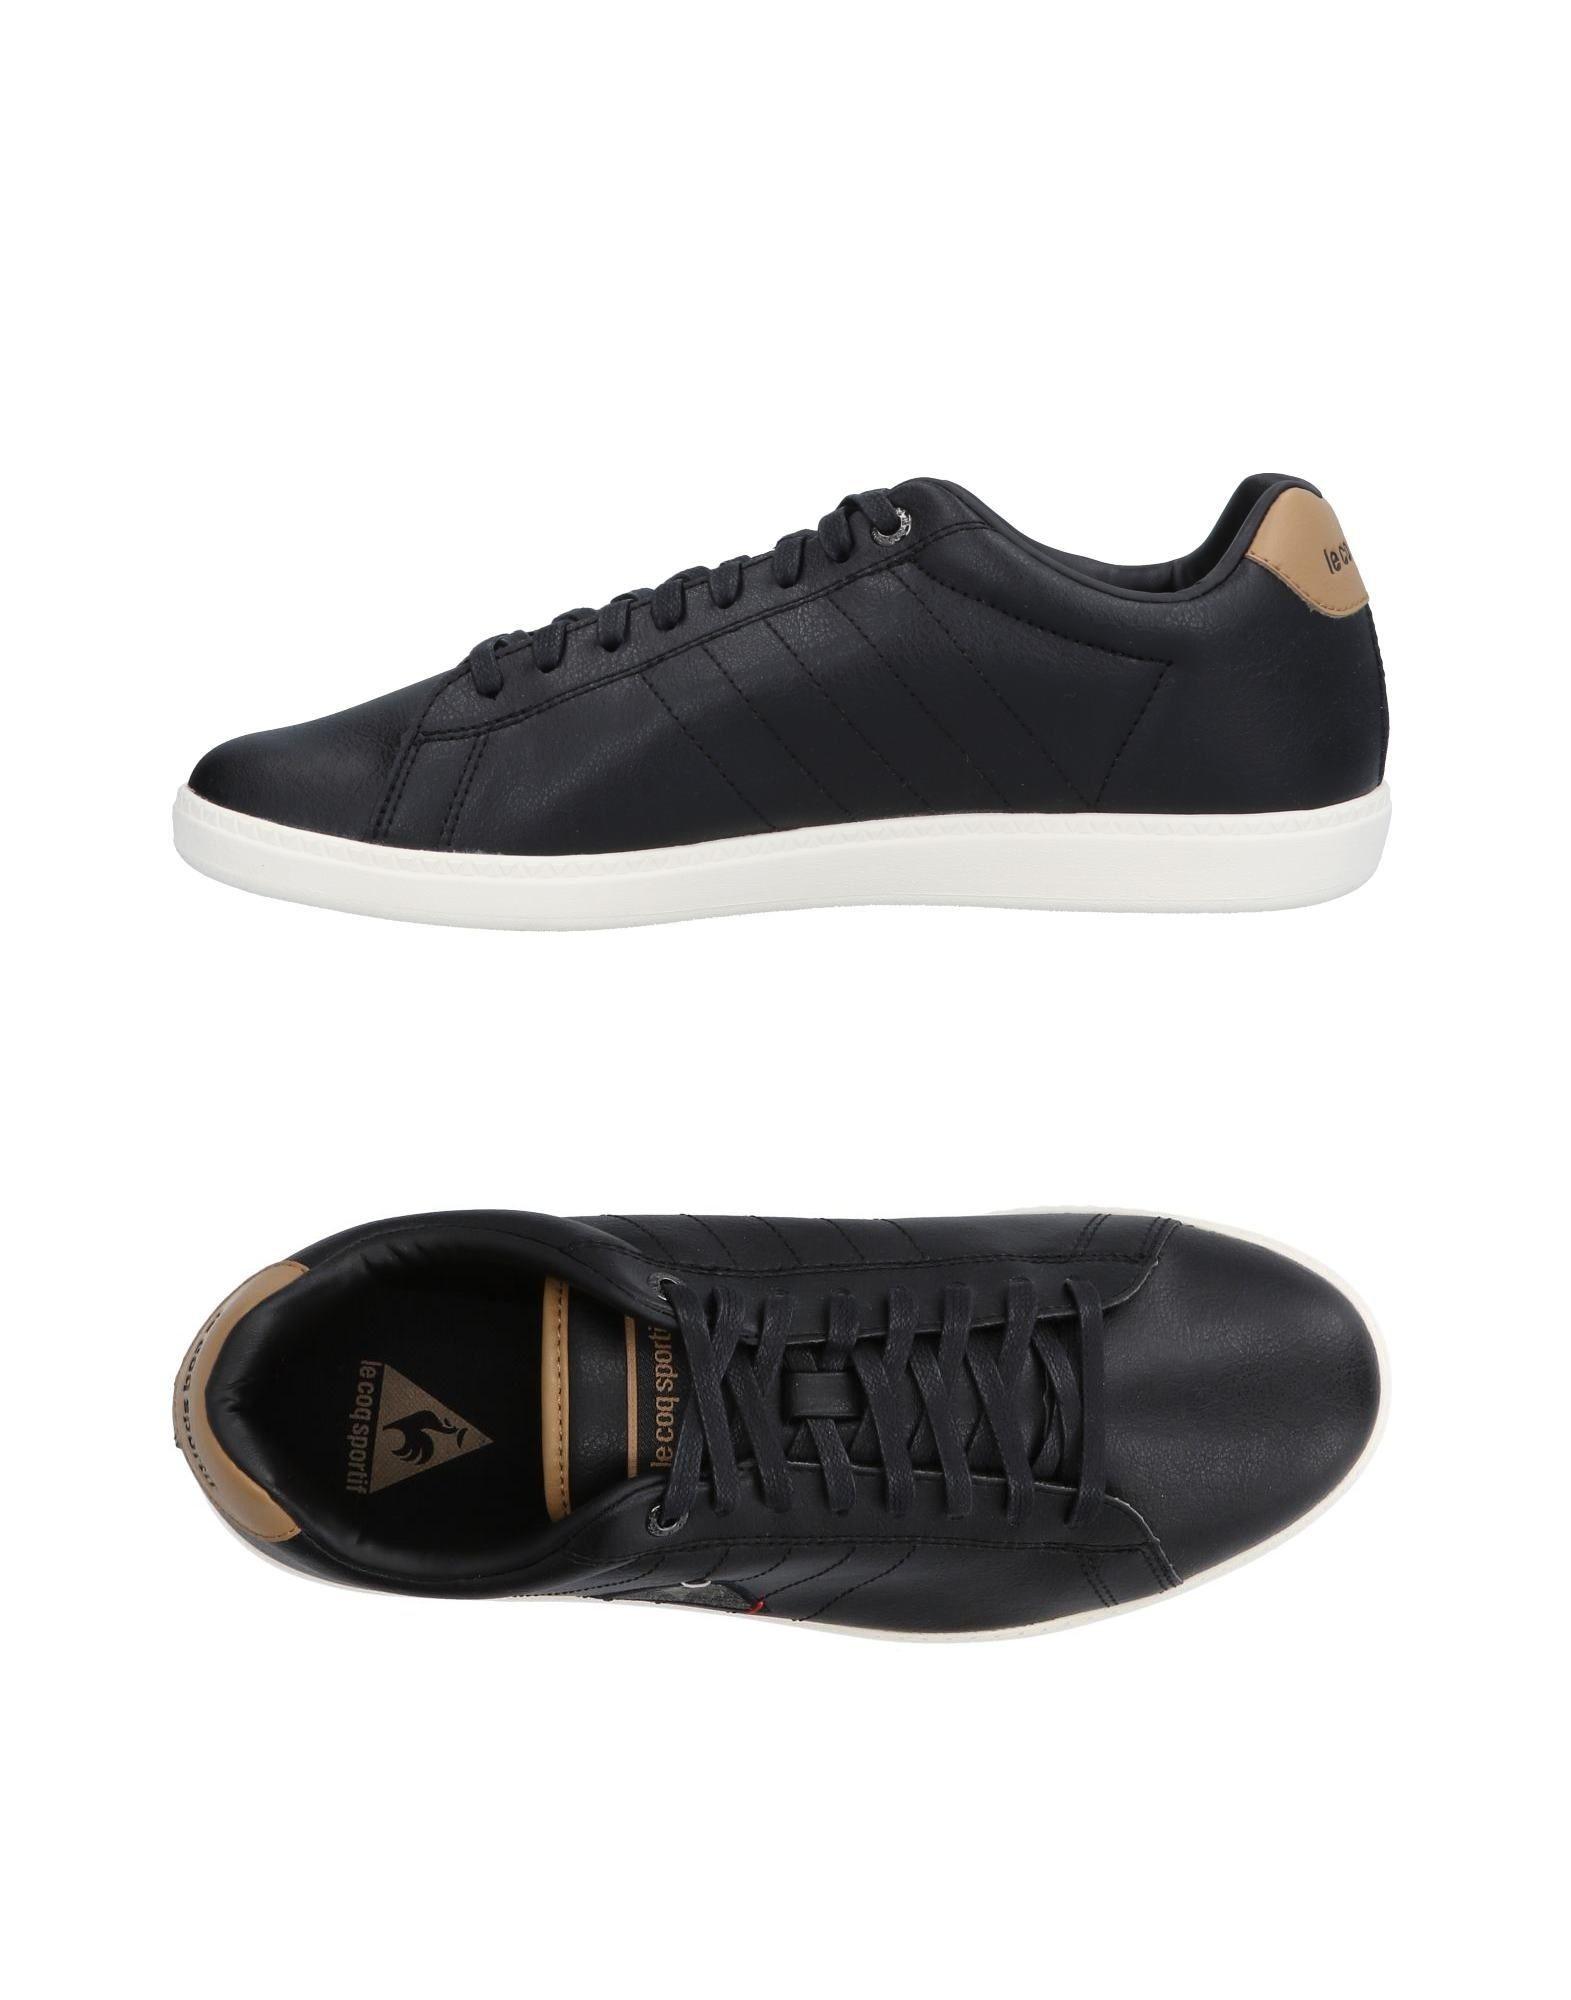 Rabatt echte Schuhe Le Coq Sportif Turnschuhes Herren 11497354GK